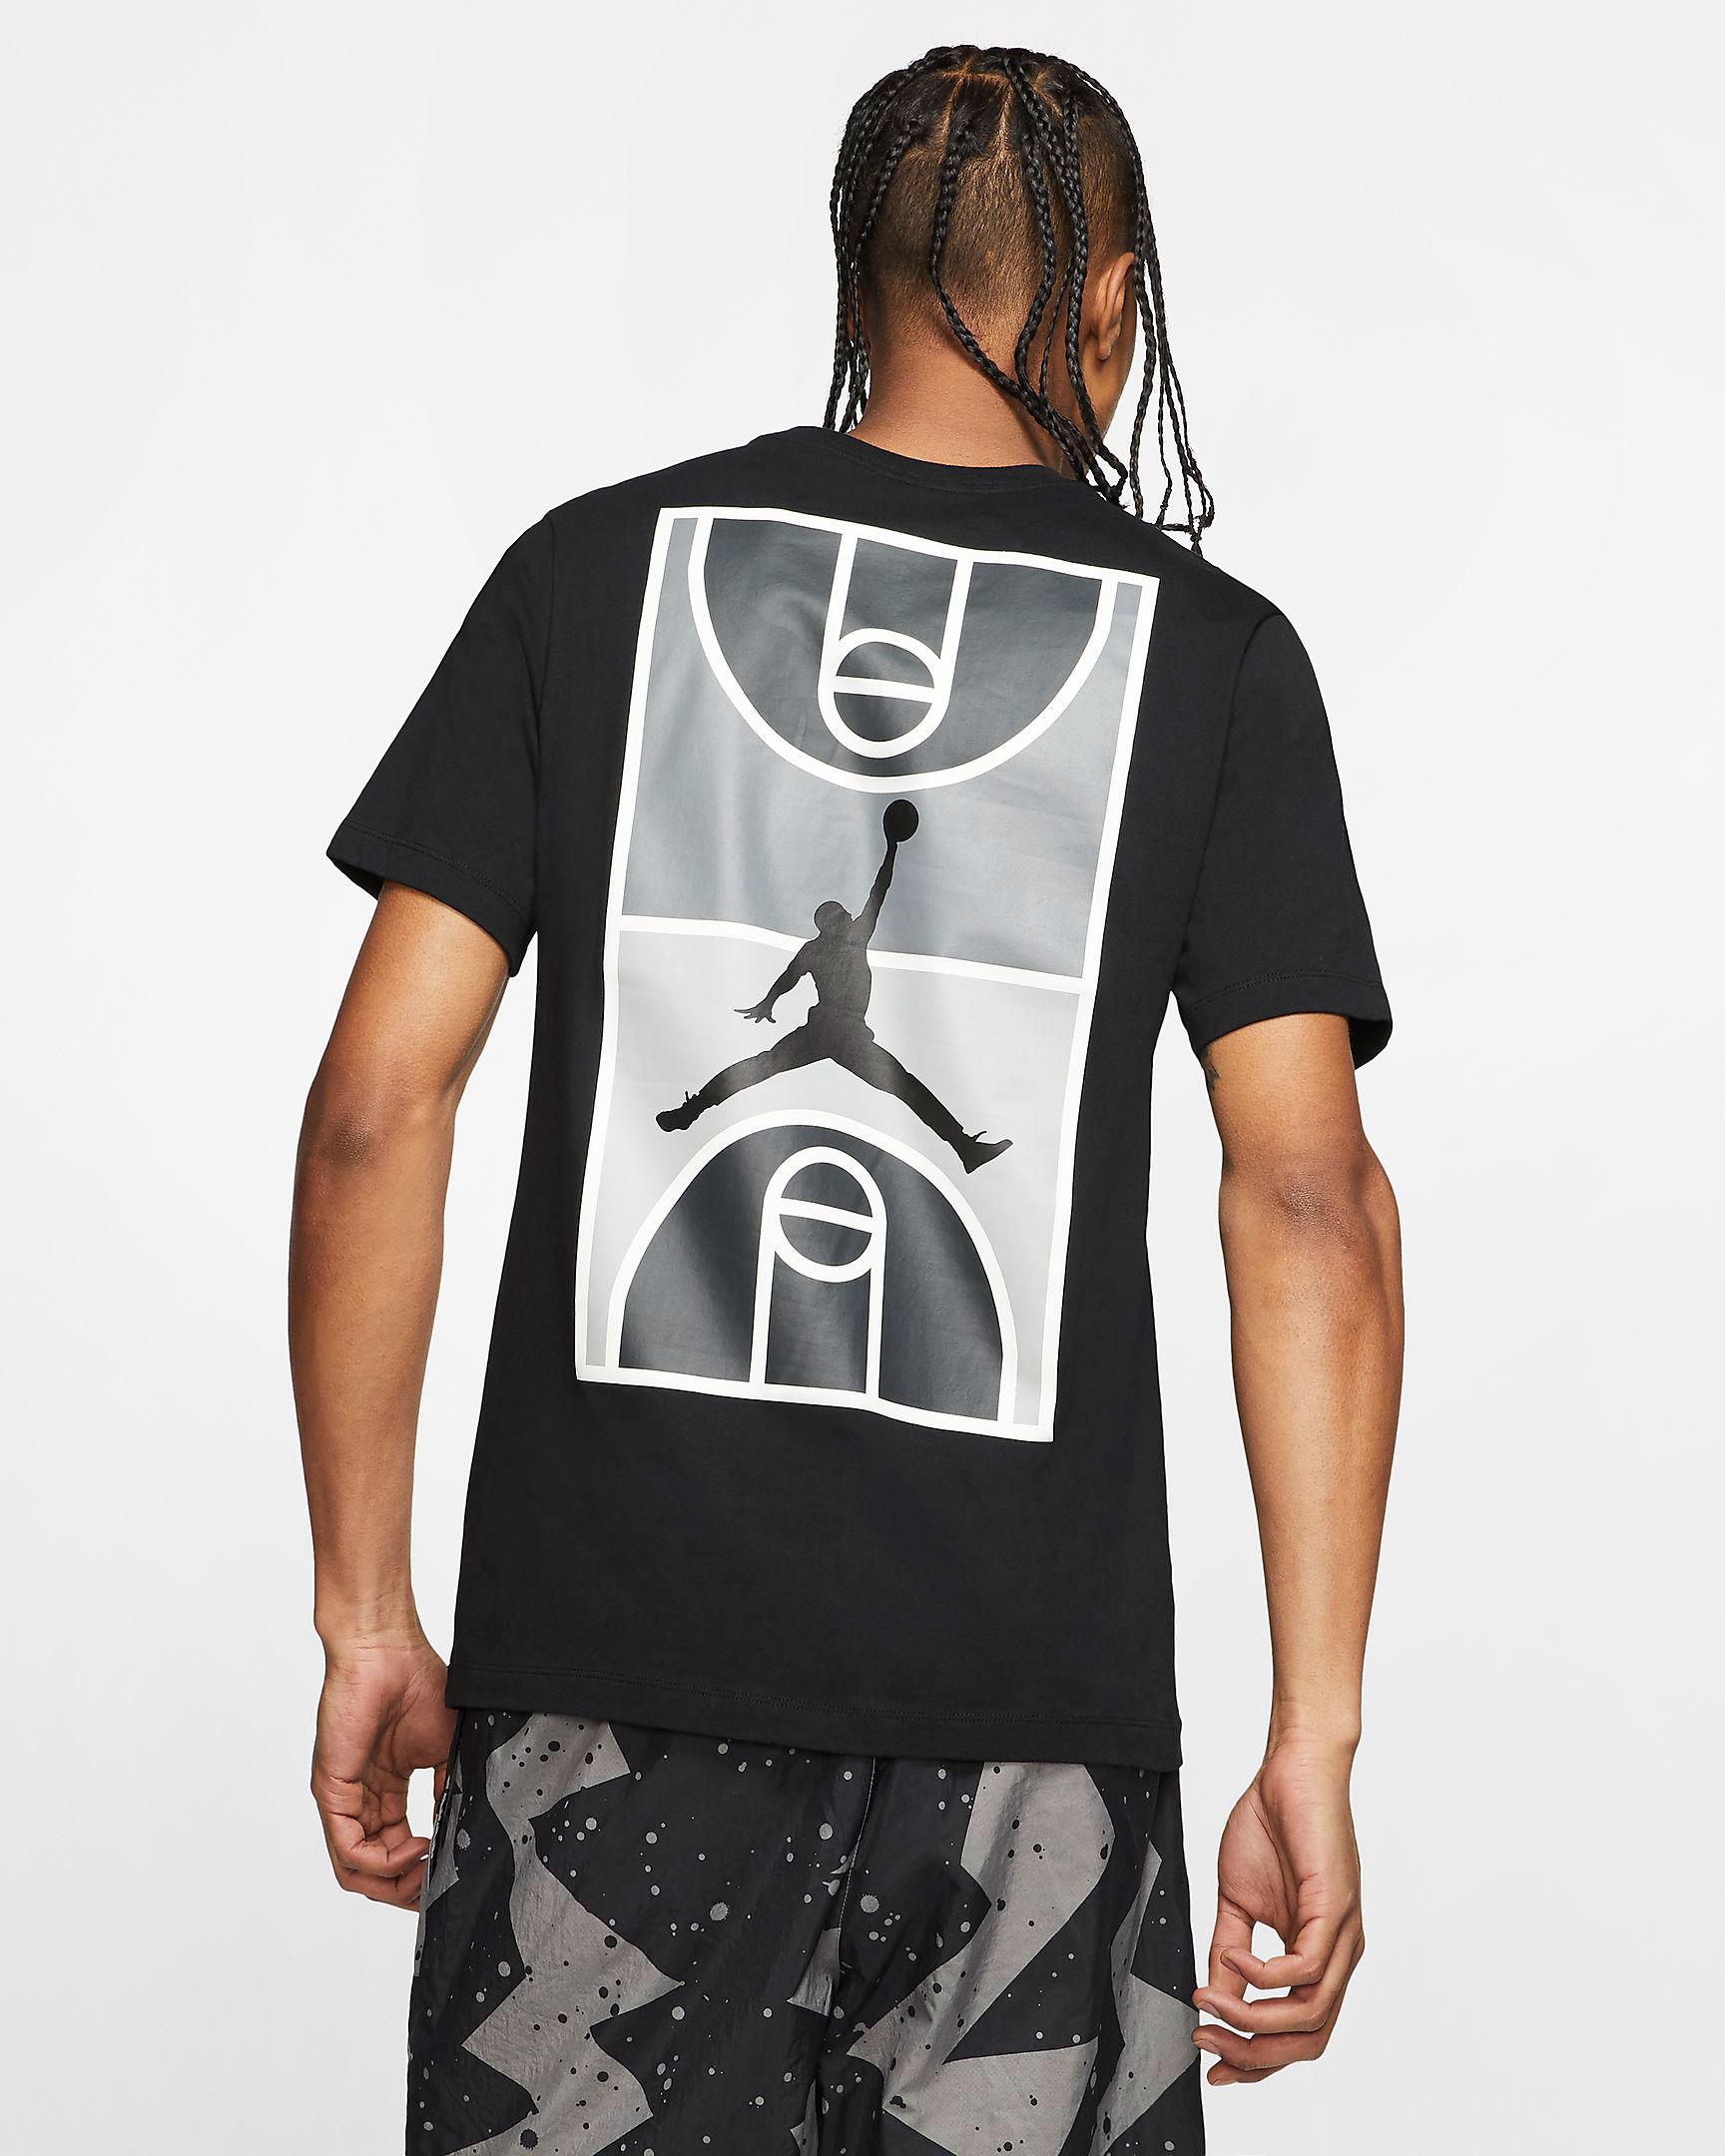 jordan-jumpman-graphic-court-tee-shirt-black-2